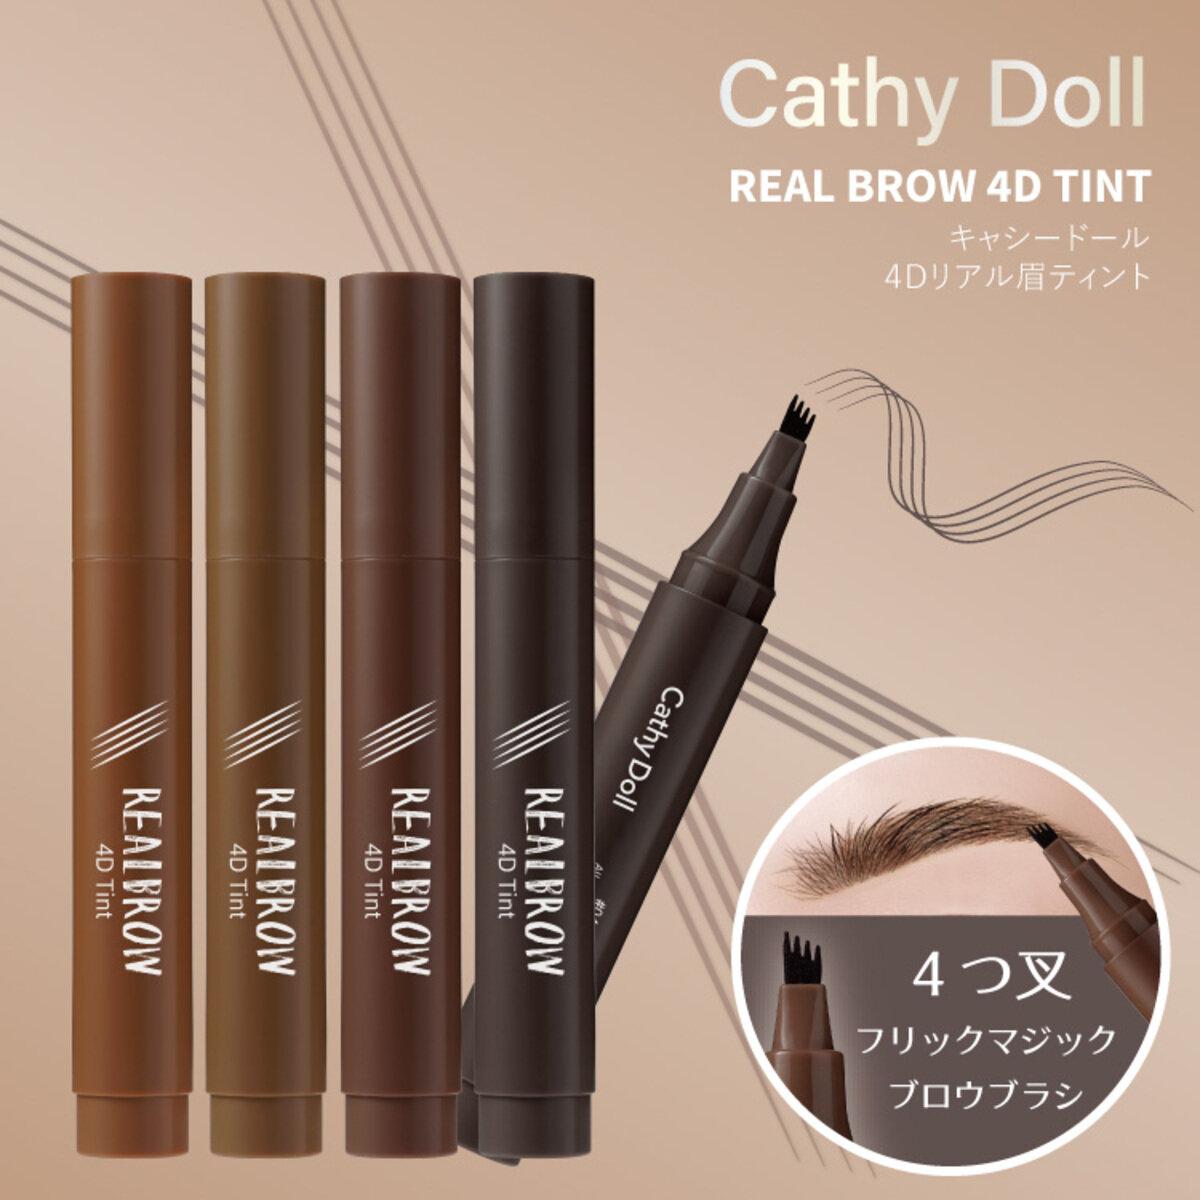 Cathy Doll(キャシードール) 4D リアル眉ティント タイコスメ